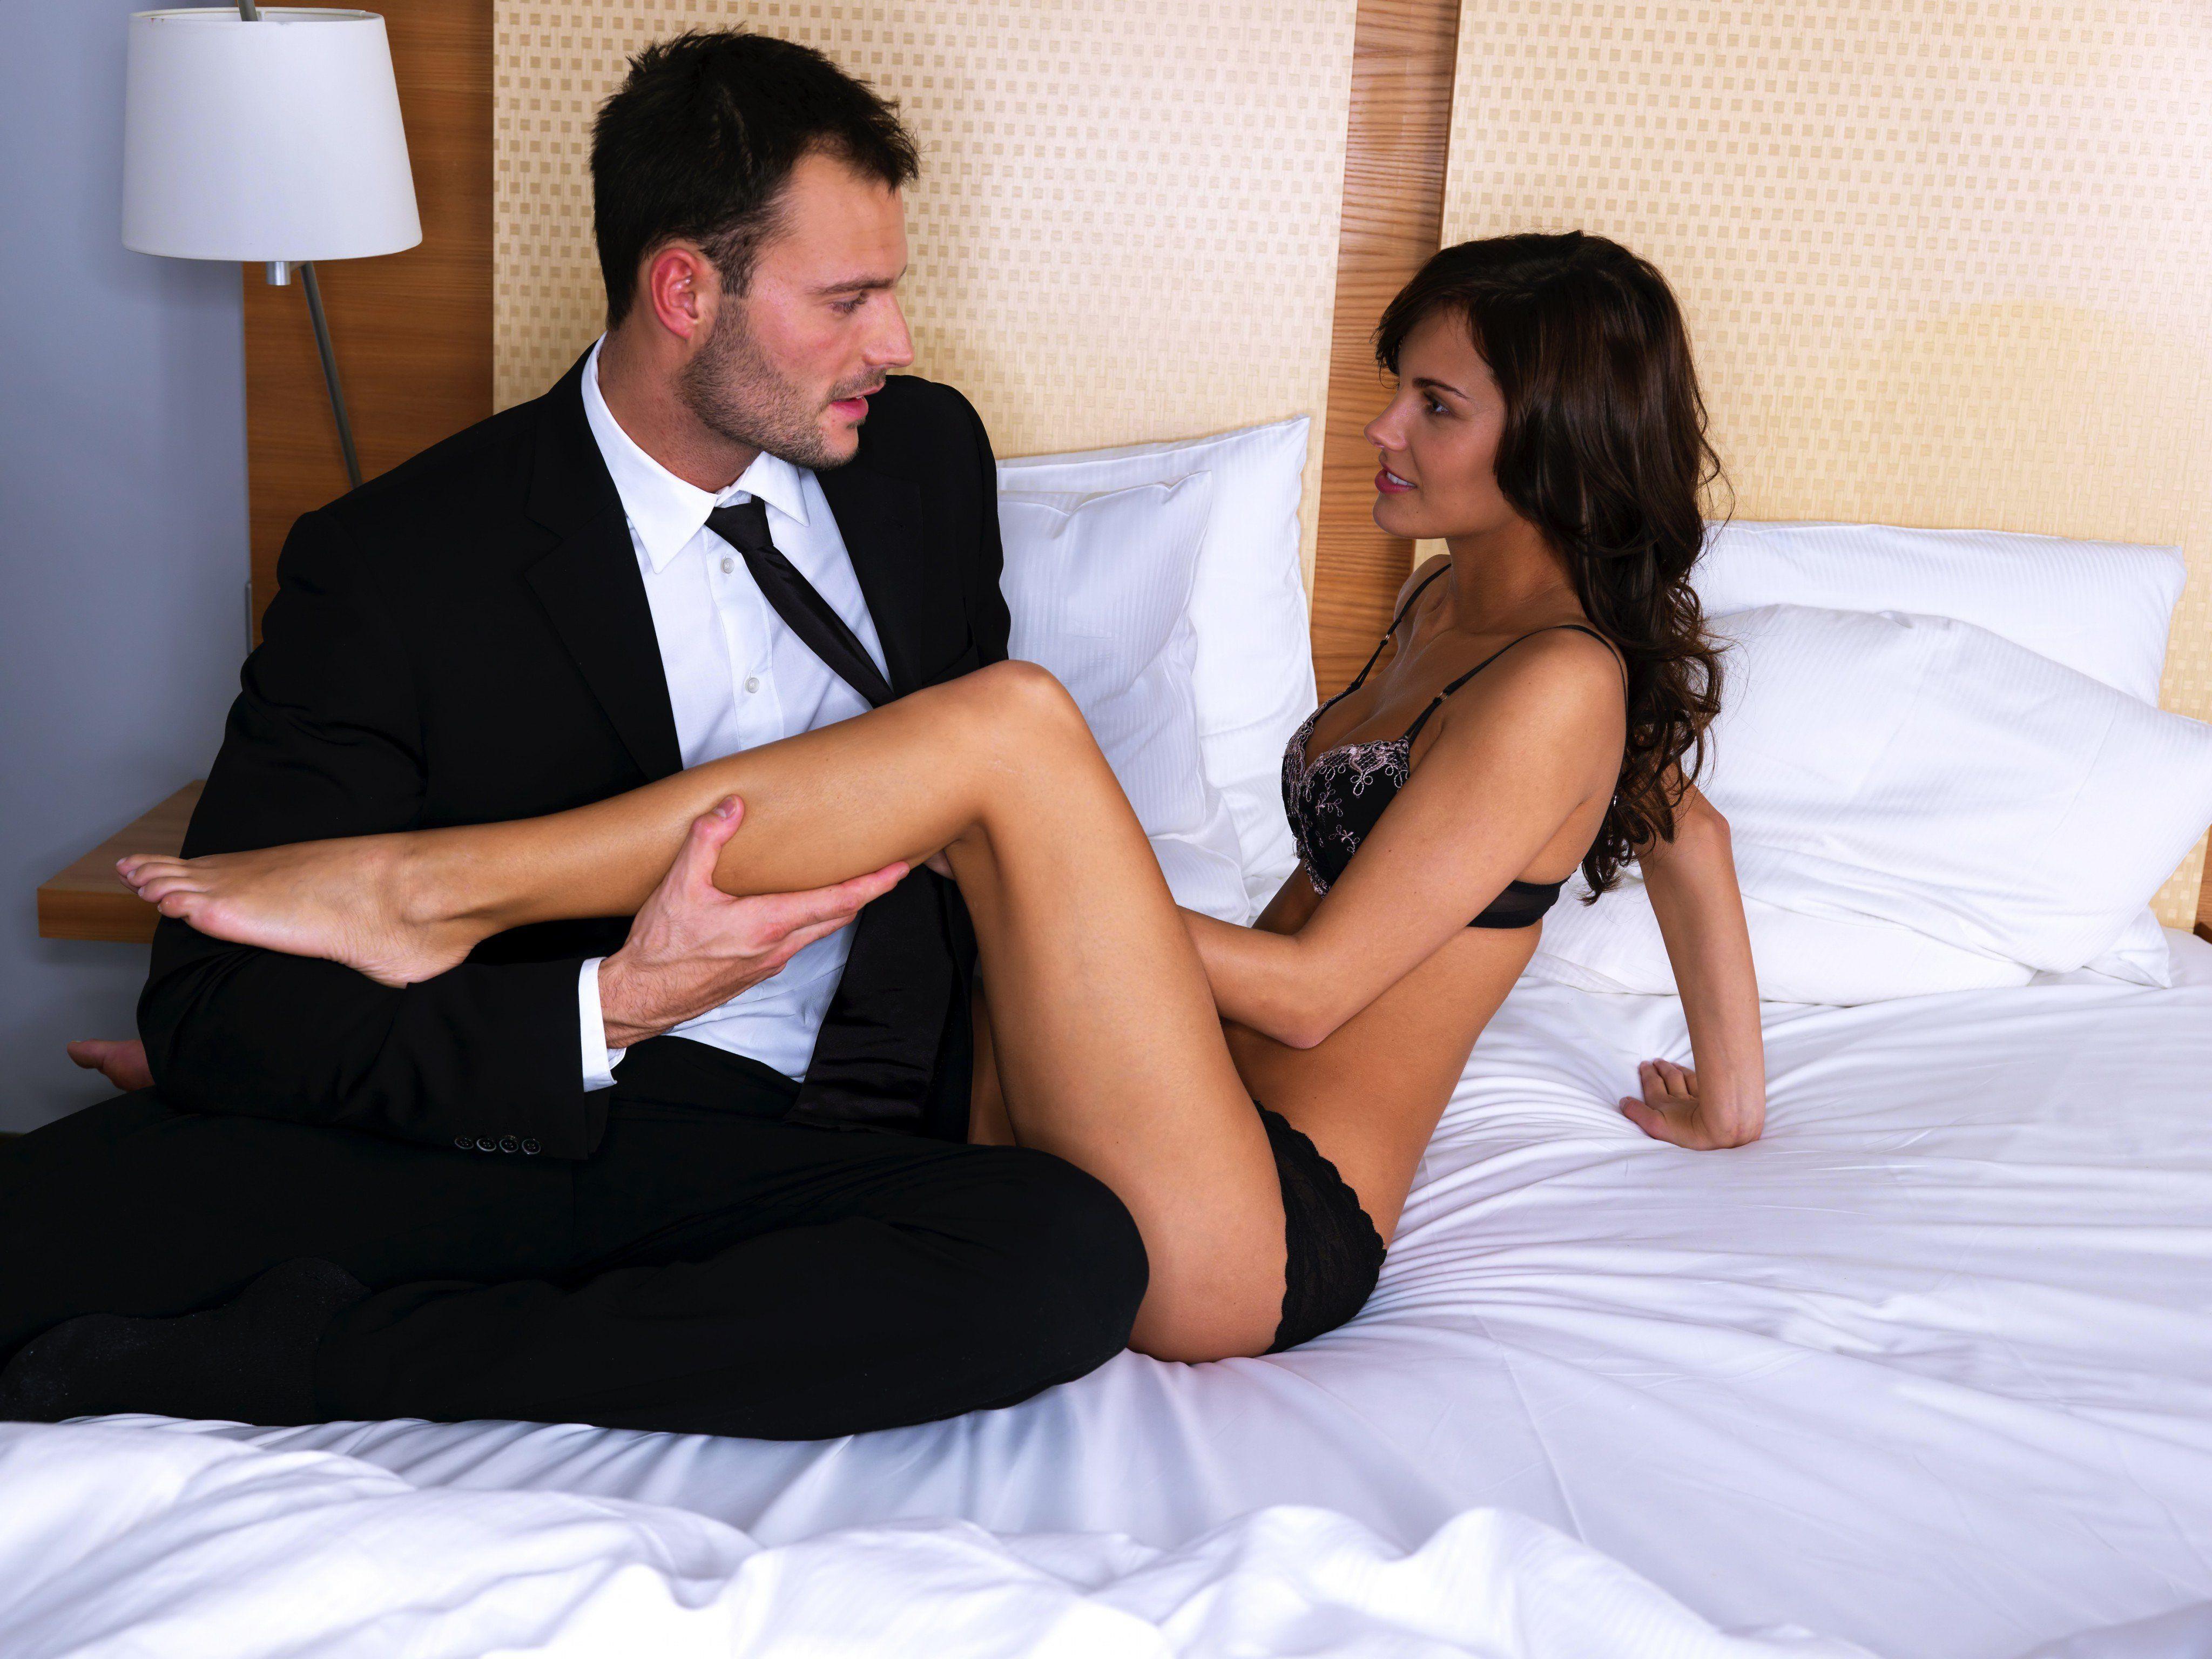 Frau sucht Mann Bregenz | Locanto Casual Dating Bregenz